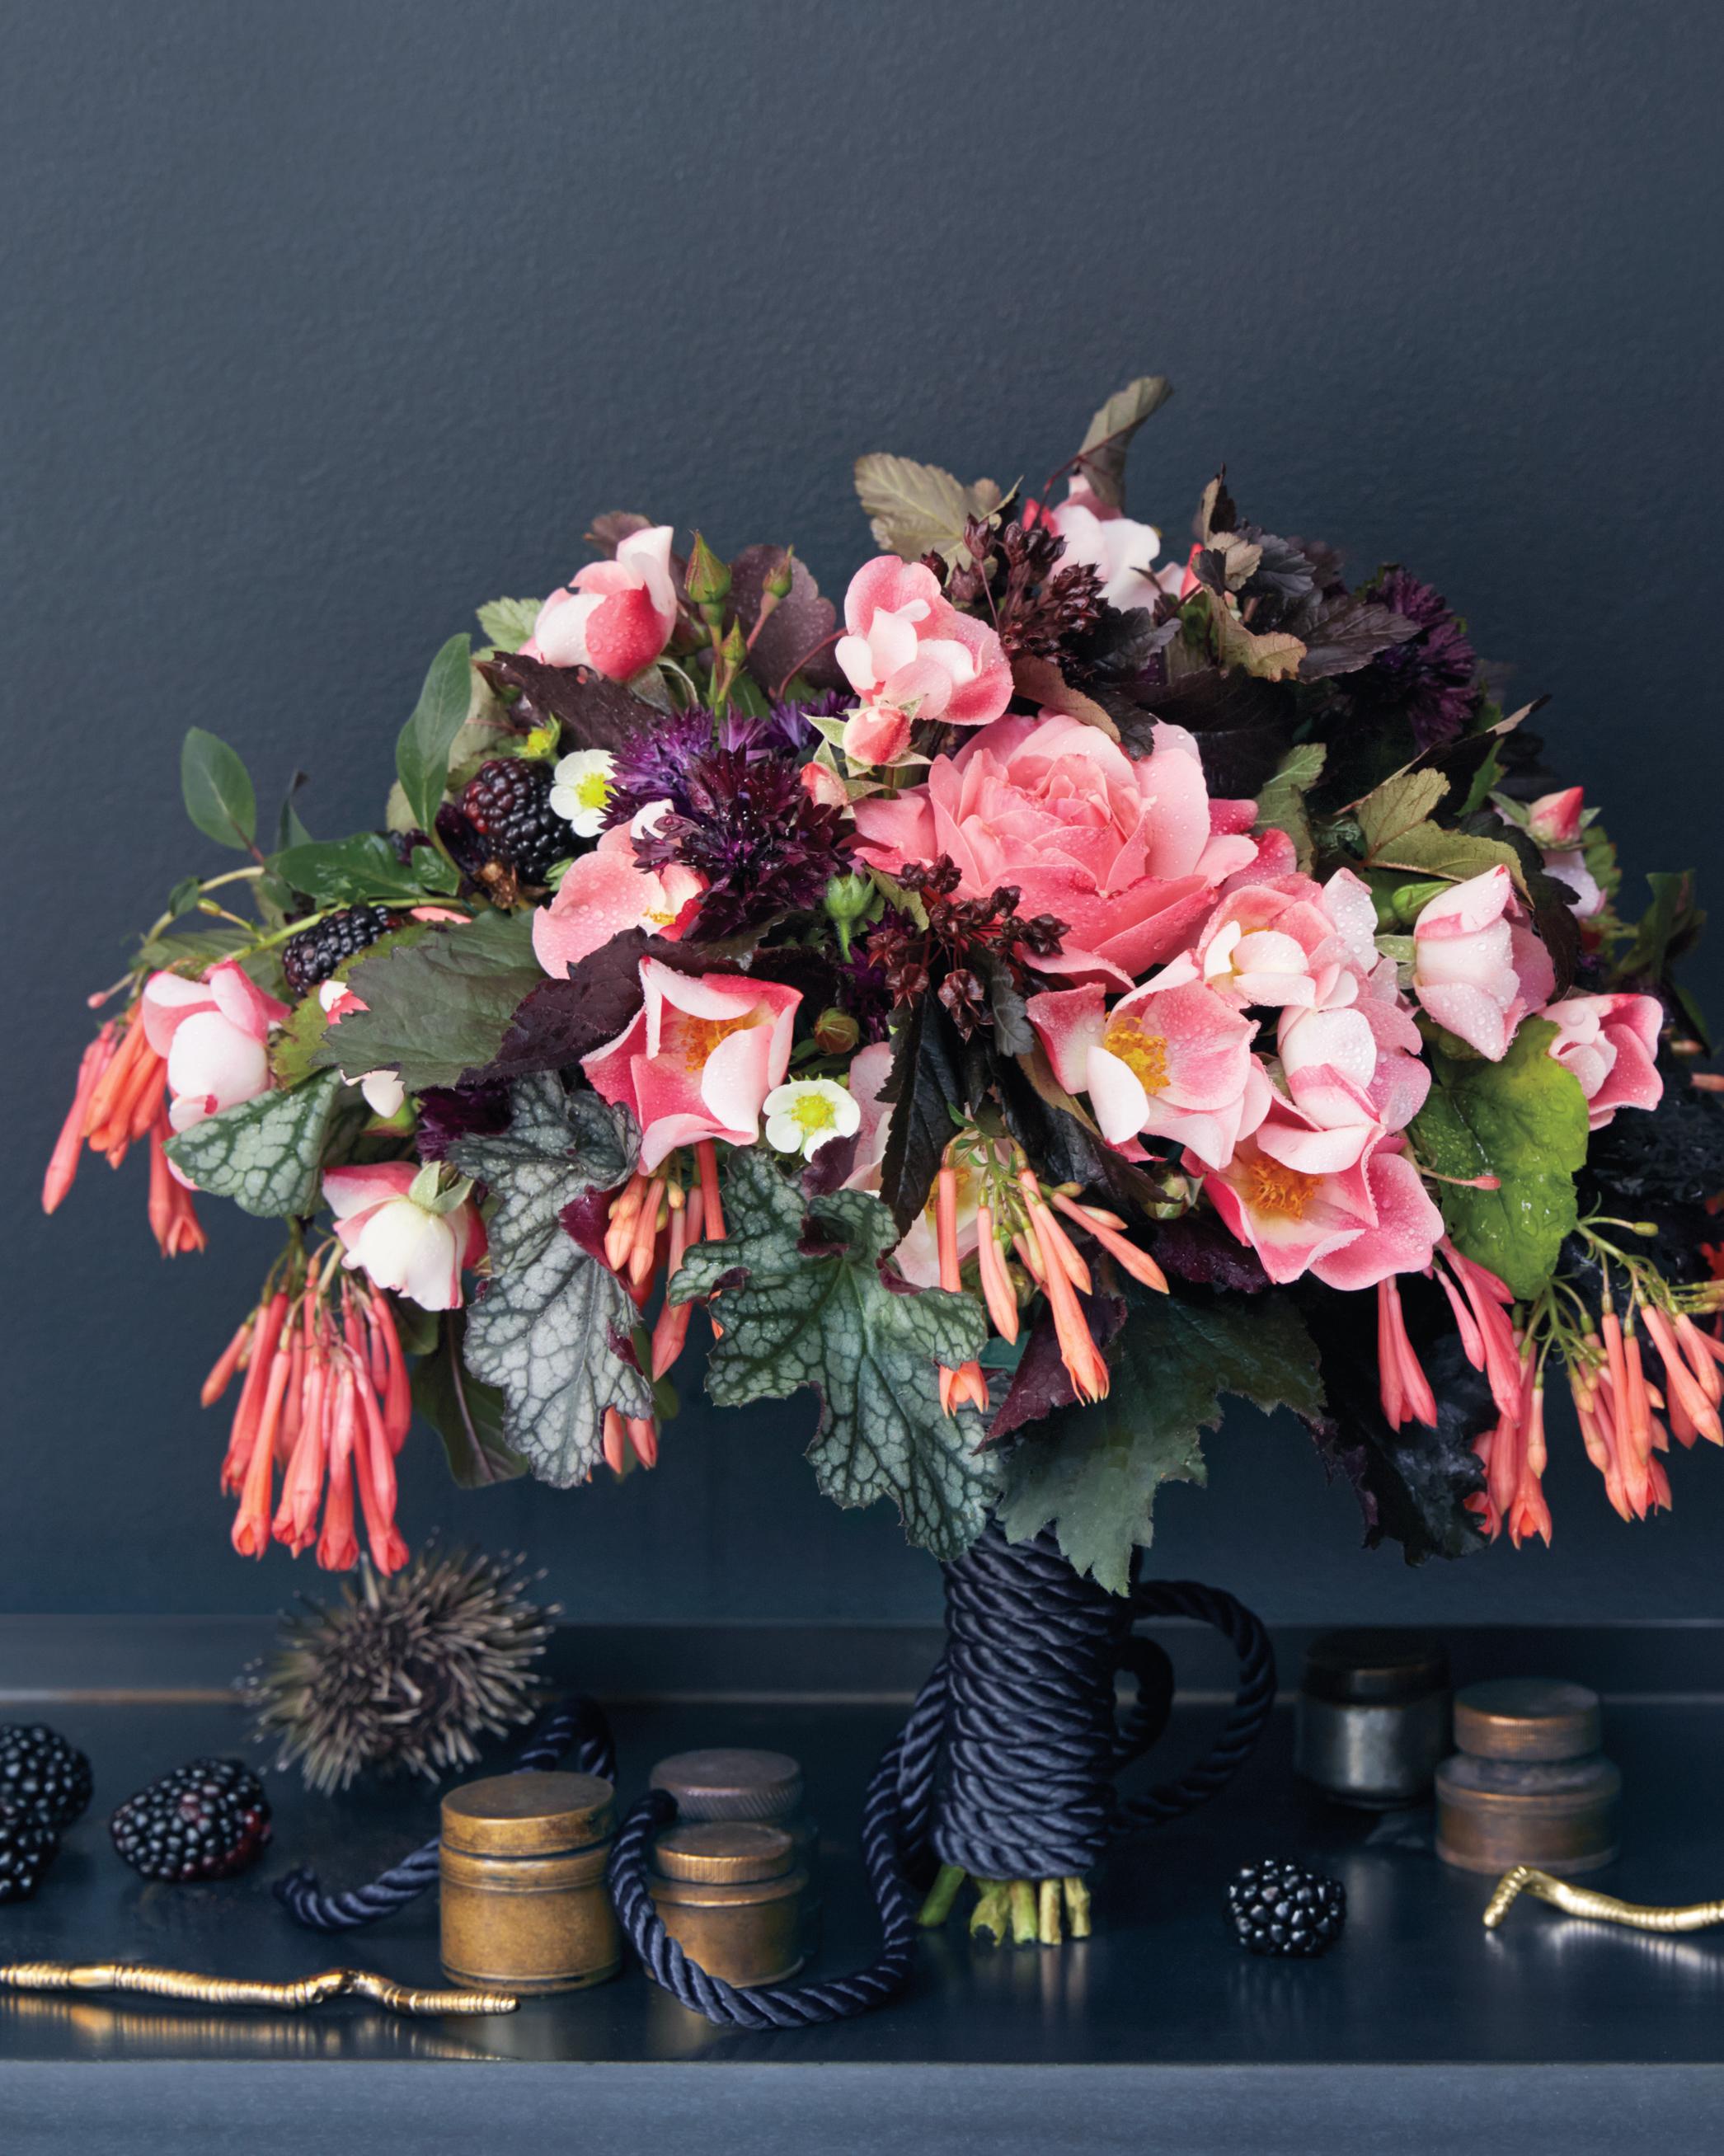 shelf-with-bouquet-097-exp-4-d111438.jpg